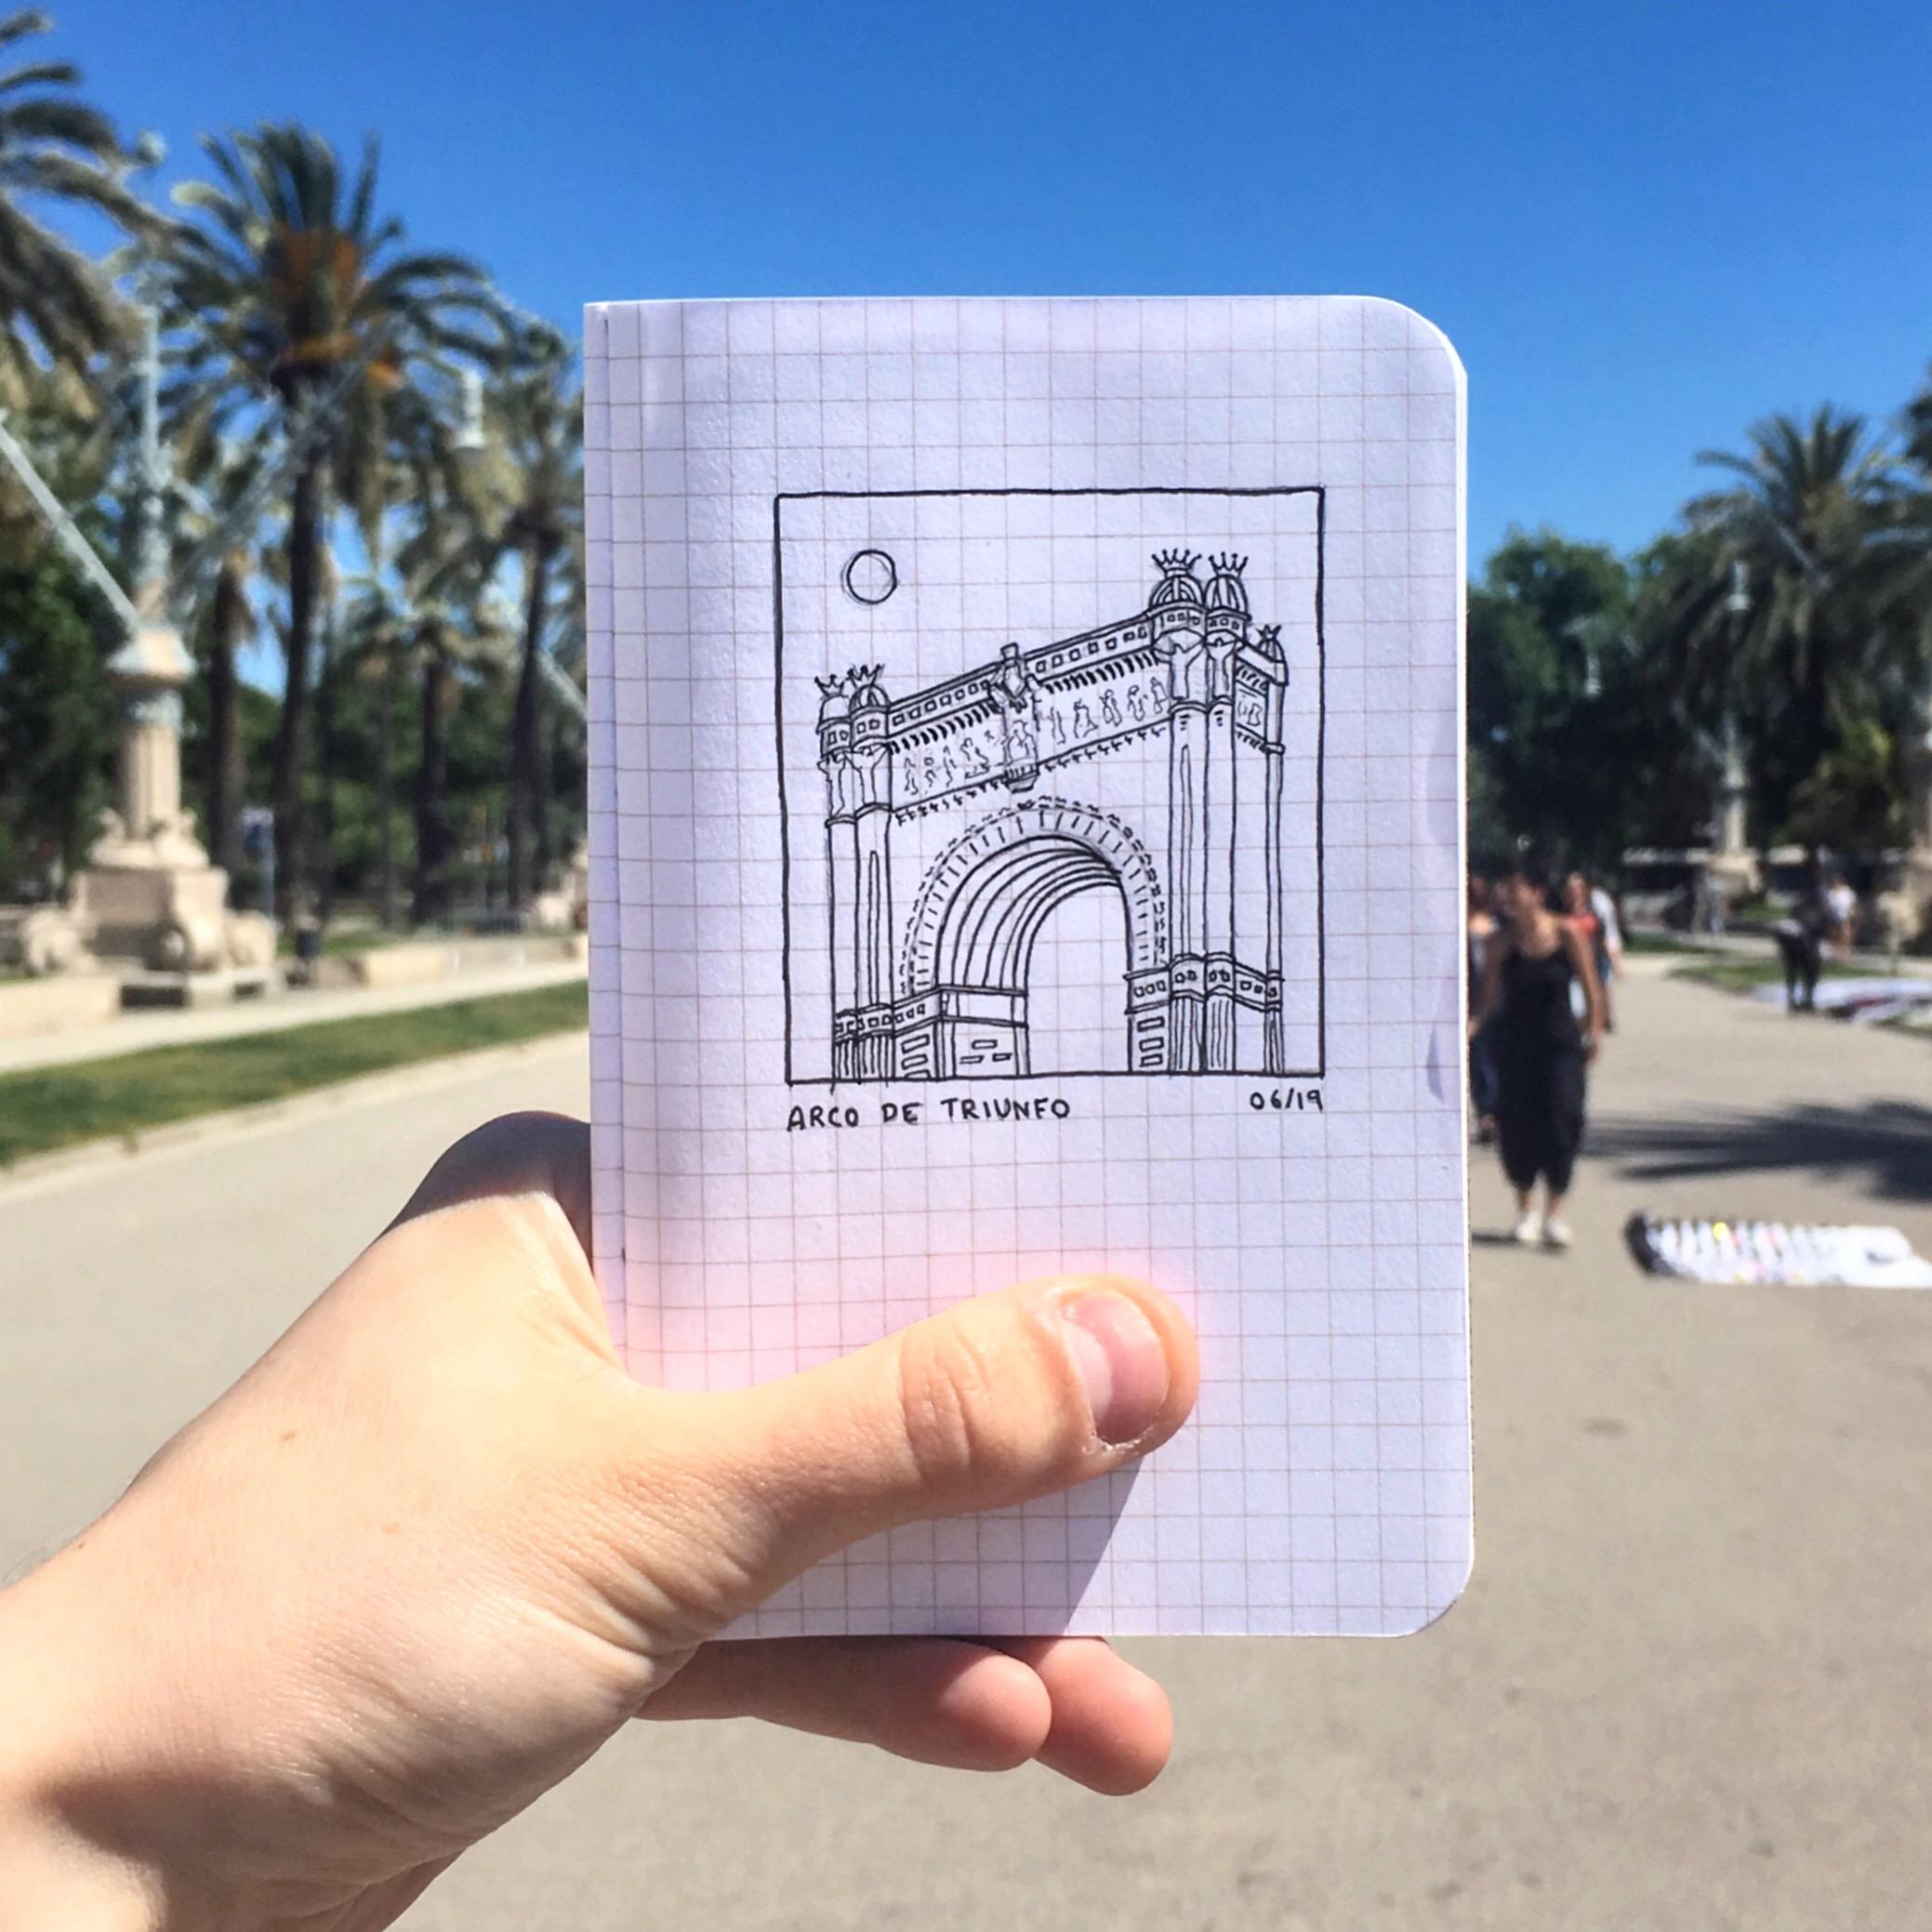 La Arco De Truinfo, Barcelona